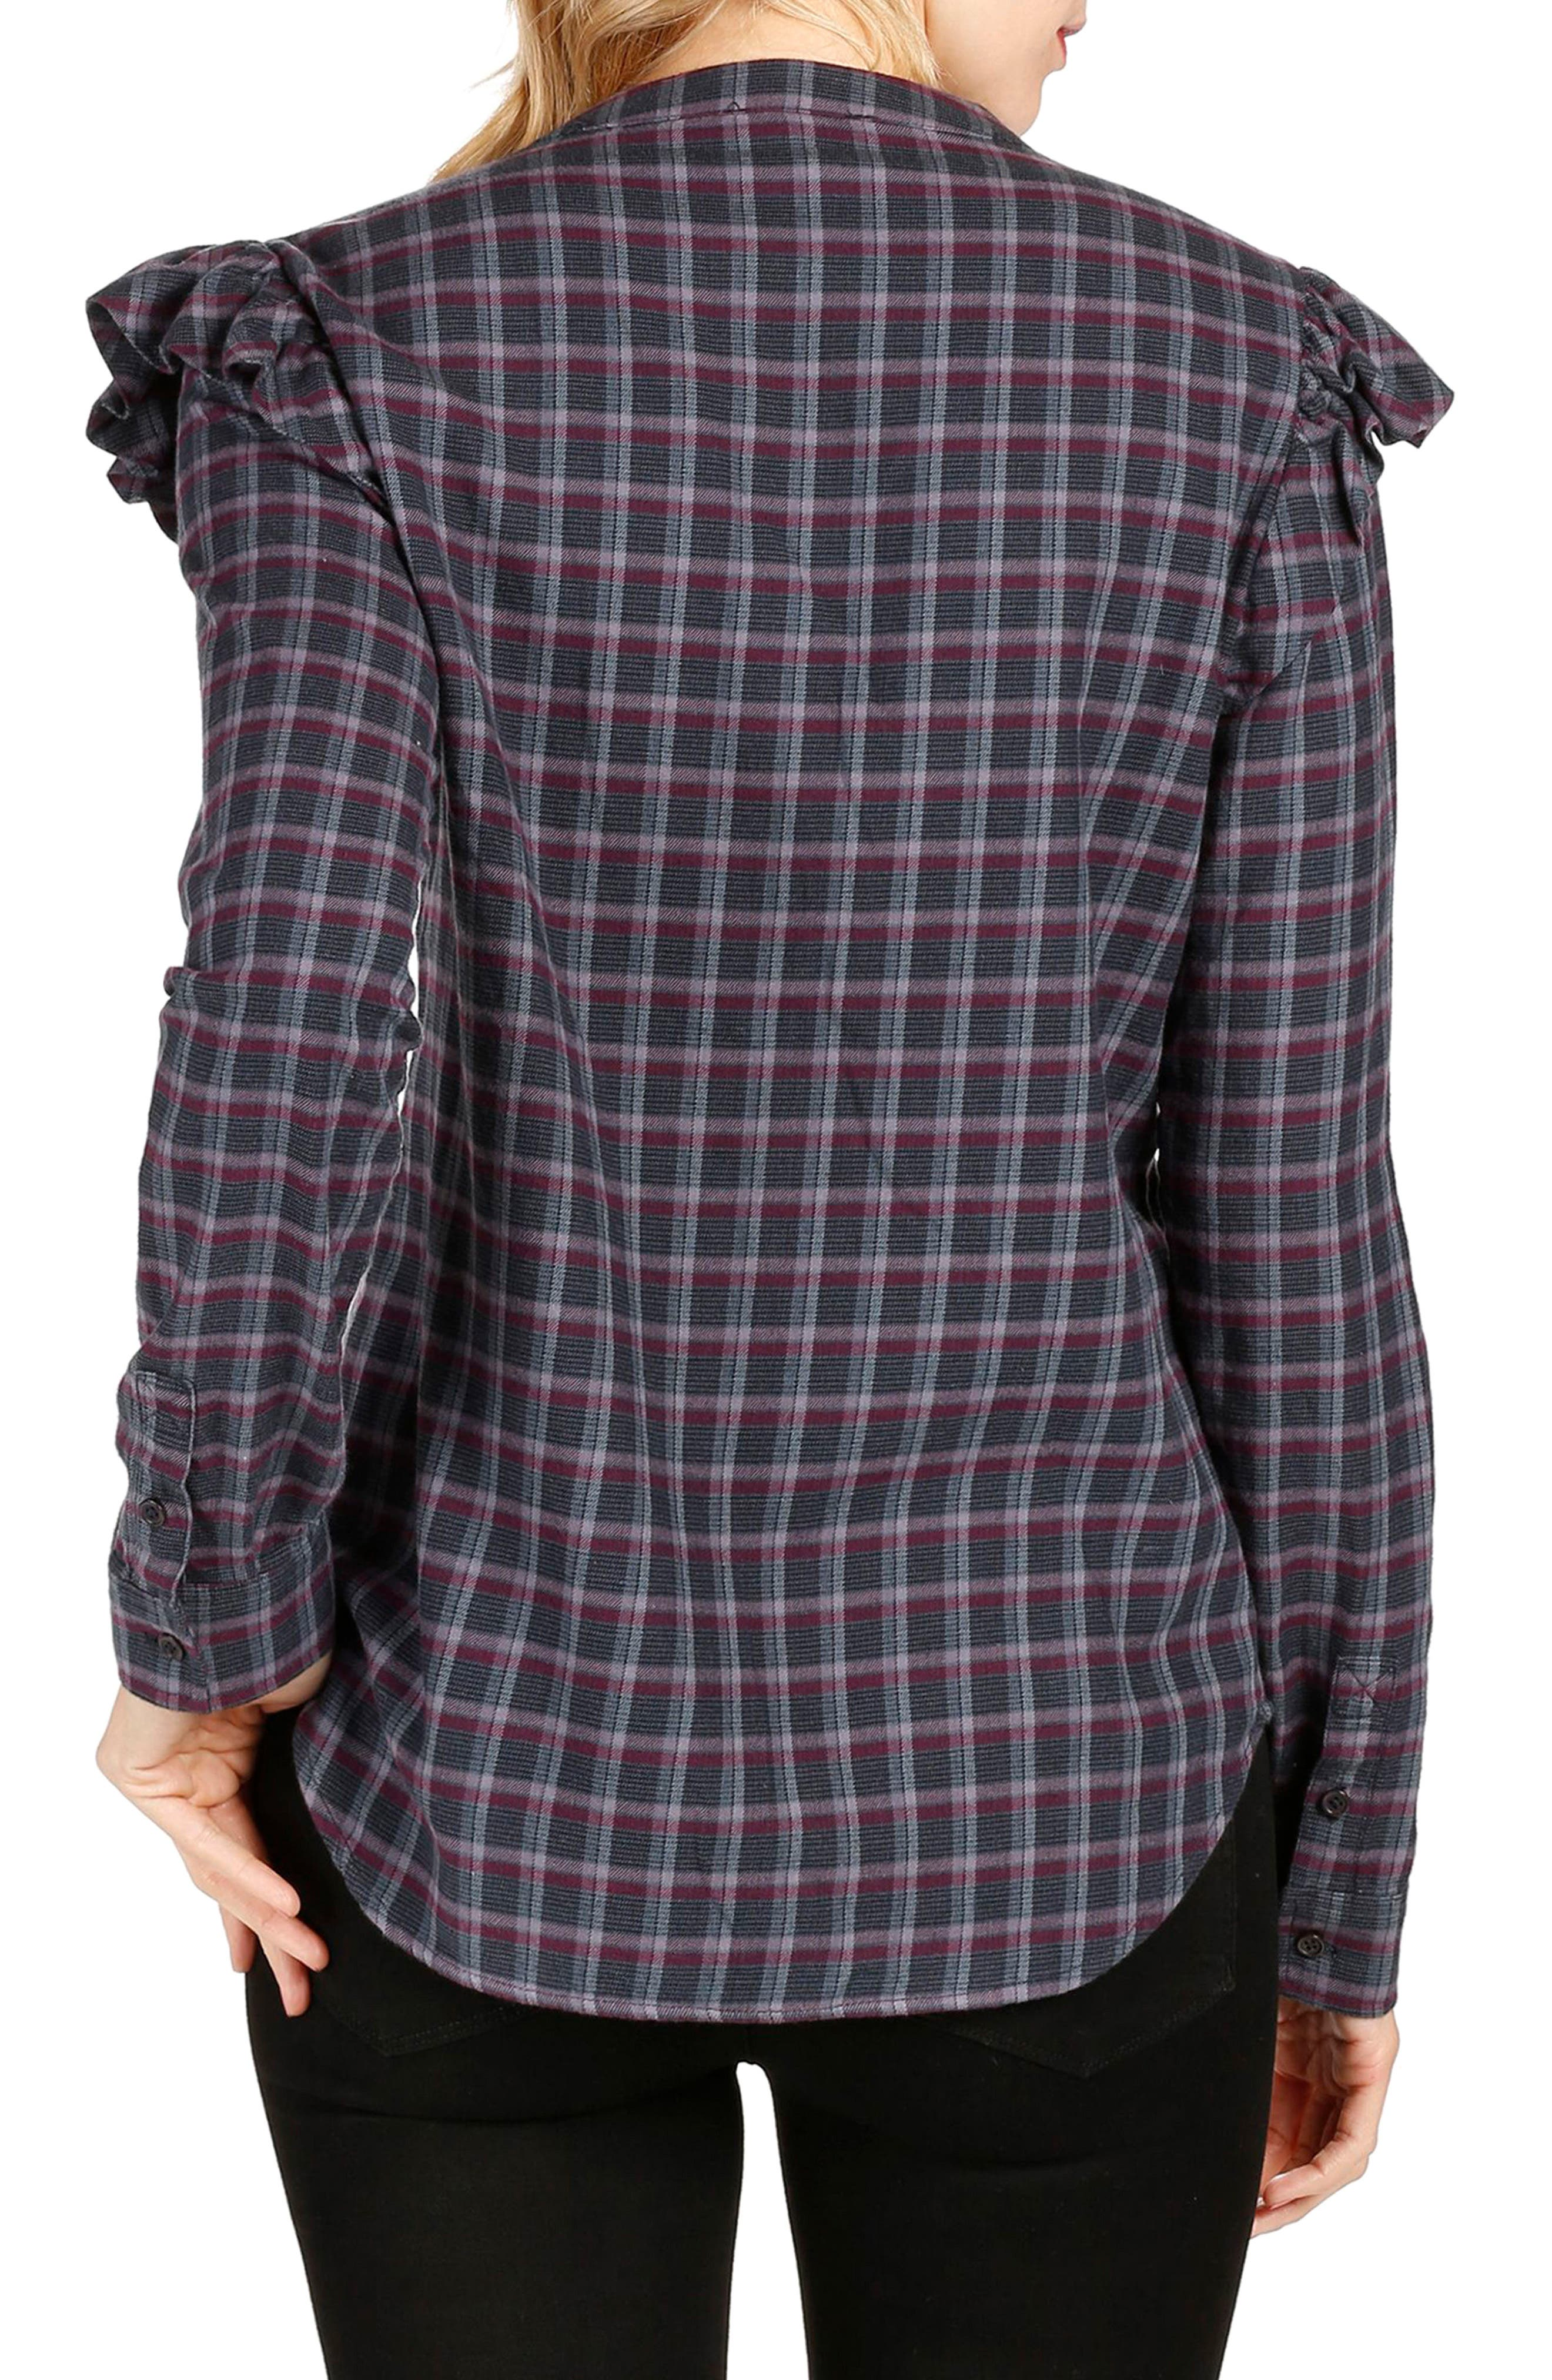 Jenelle Ruffle Plaid Shirt,                             Alternate thumbnail 3, color,                             Eclipse Multi